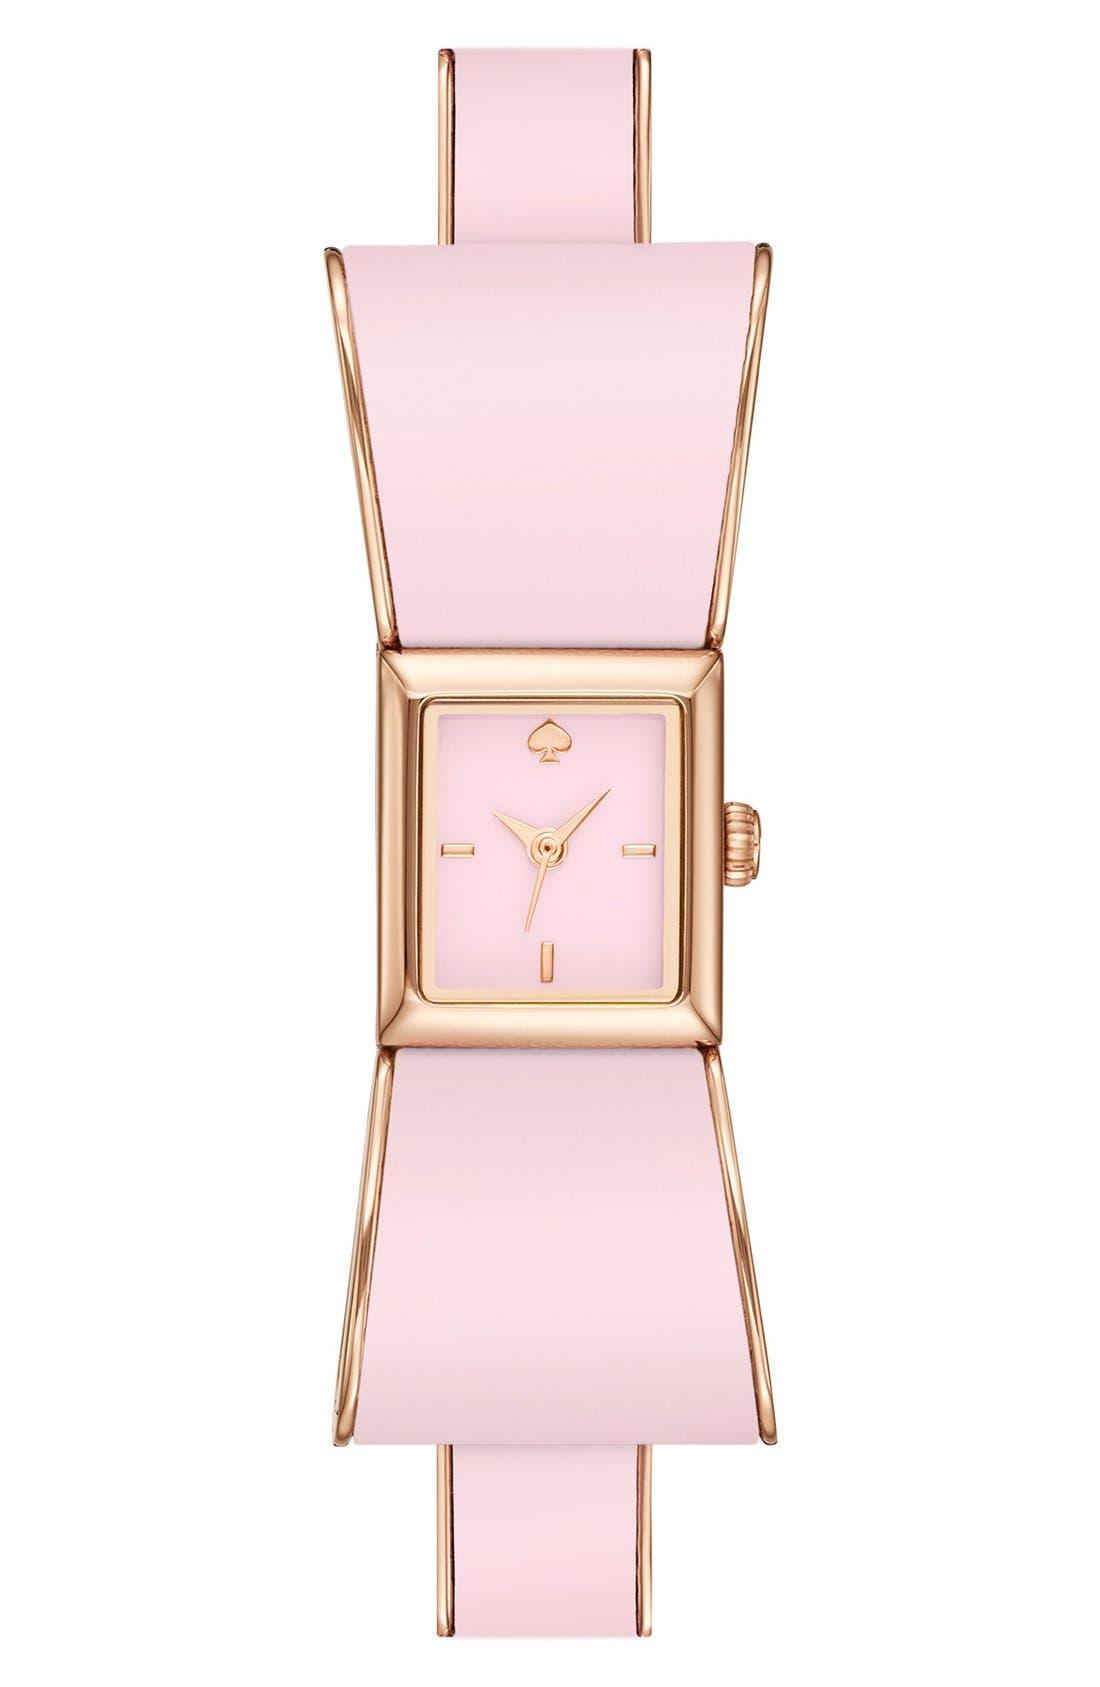 Main Image - kate spade new york 'kenmare' bracelet watch, 15mm x 18mm